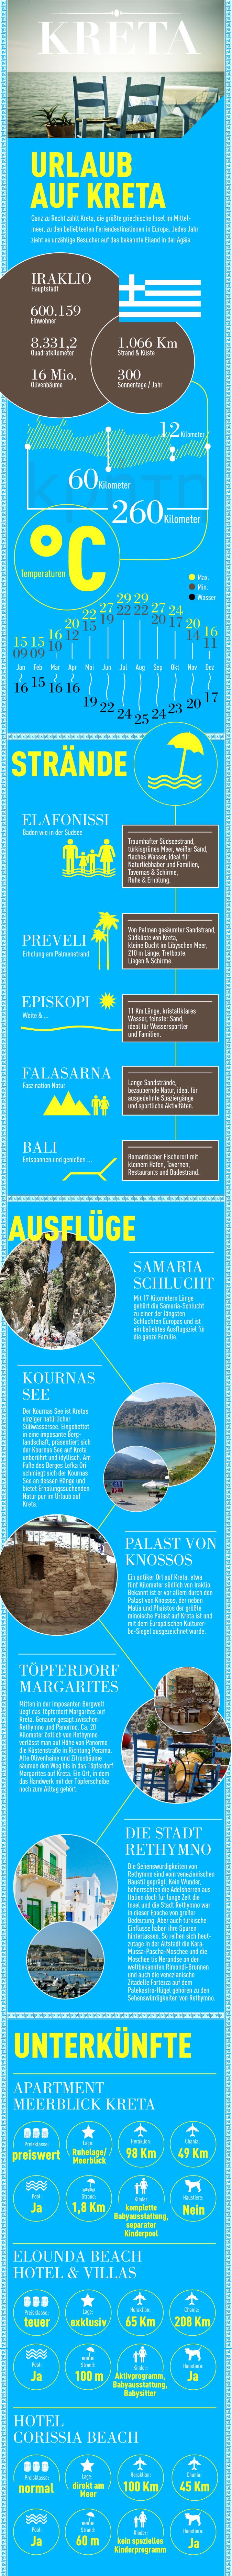 Infografik: Urlaub auf Kreta